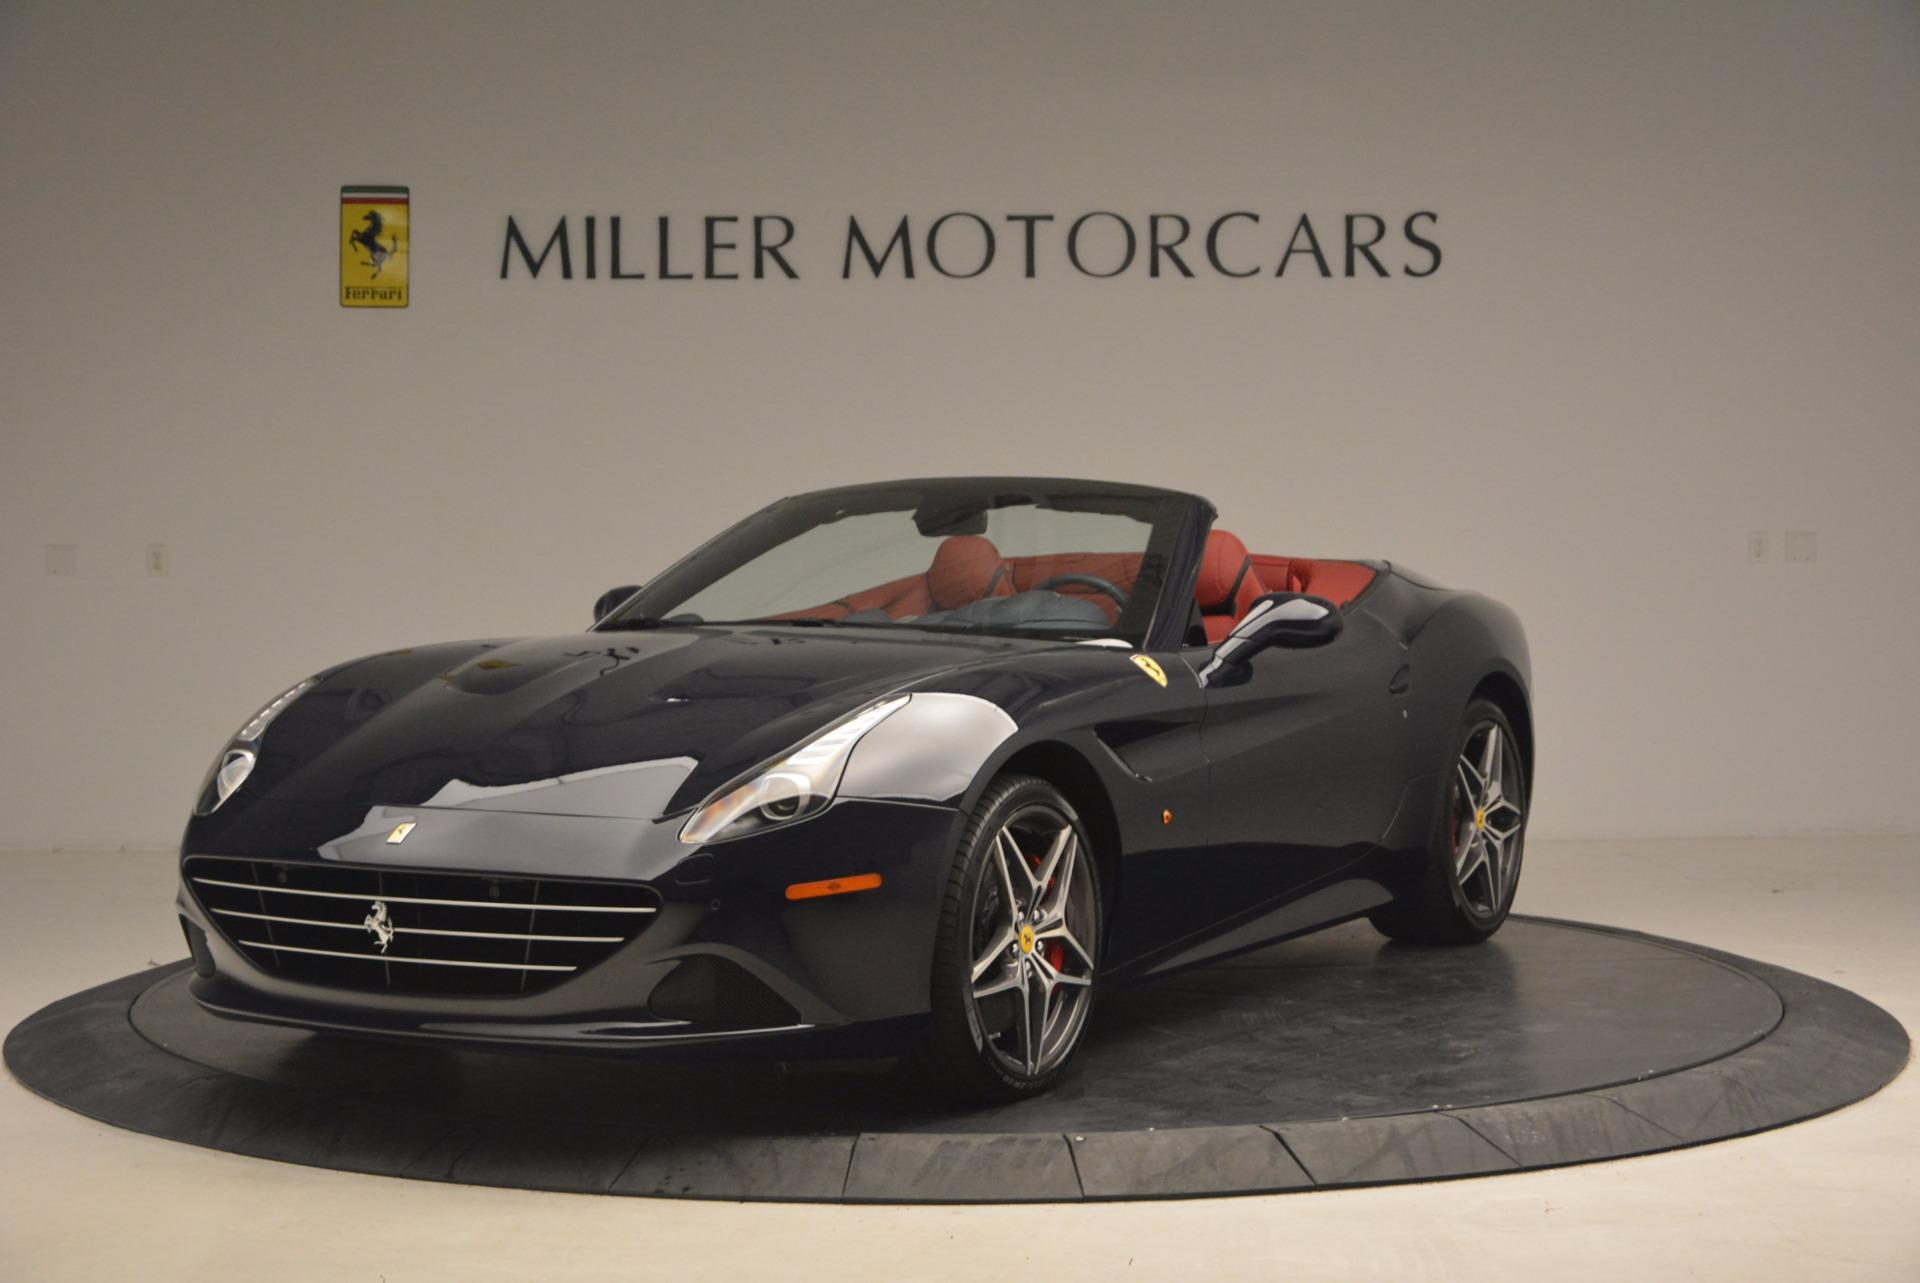 Used 2017 Ferrari California T for sale Sold at Aston Martin of Greenwich in Greenwich CT 06830 1